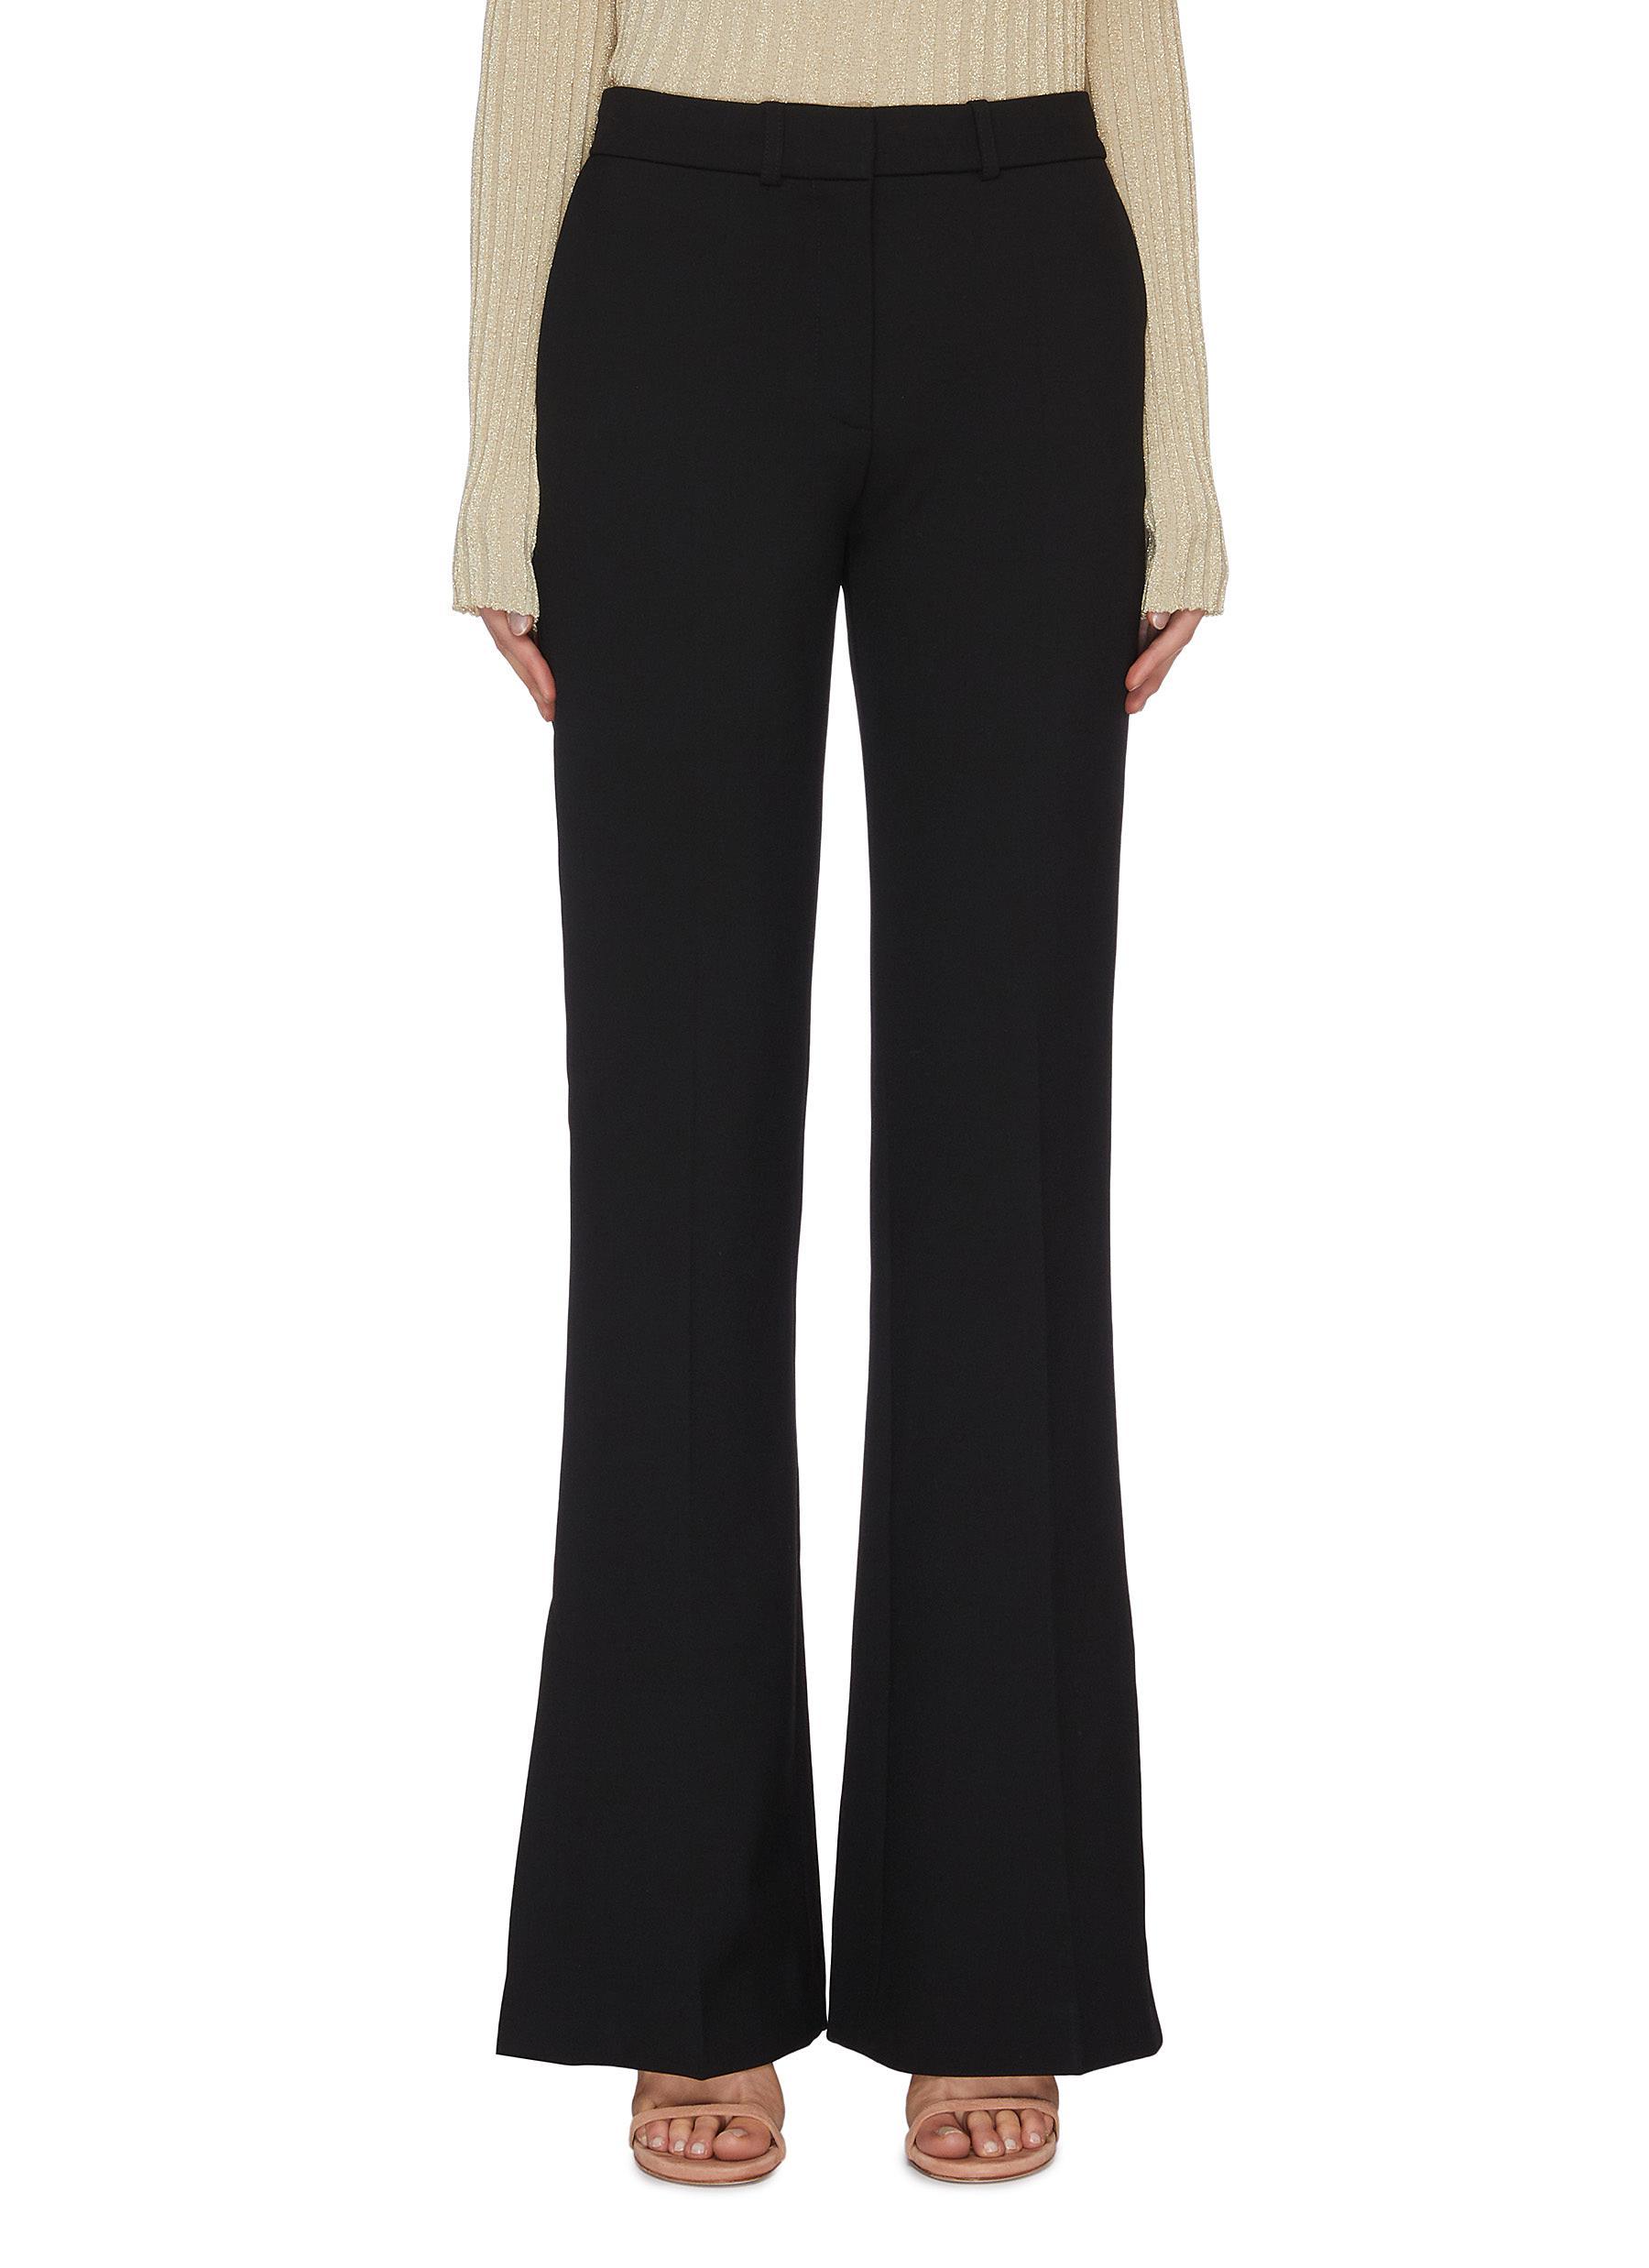 Buy Victoria, Victoria Beckham Pants & Shorts 'Victoria' split hem flared tuxedo pants